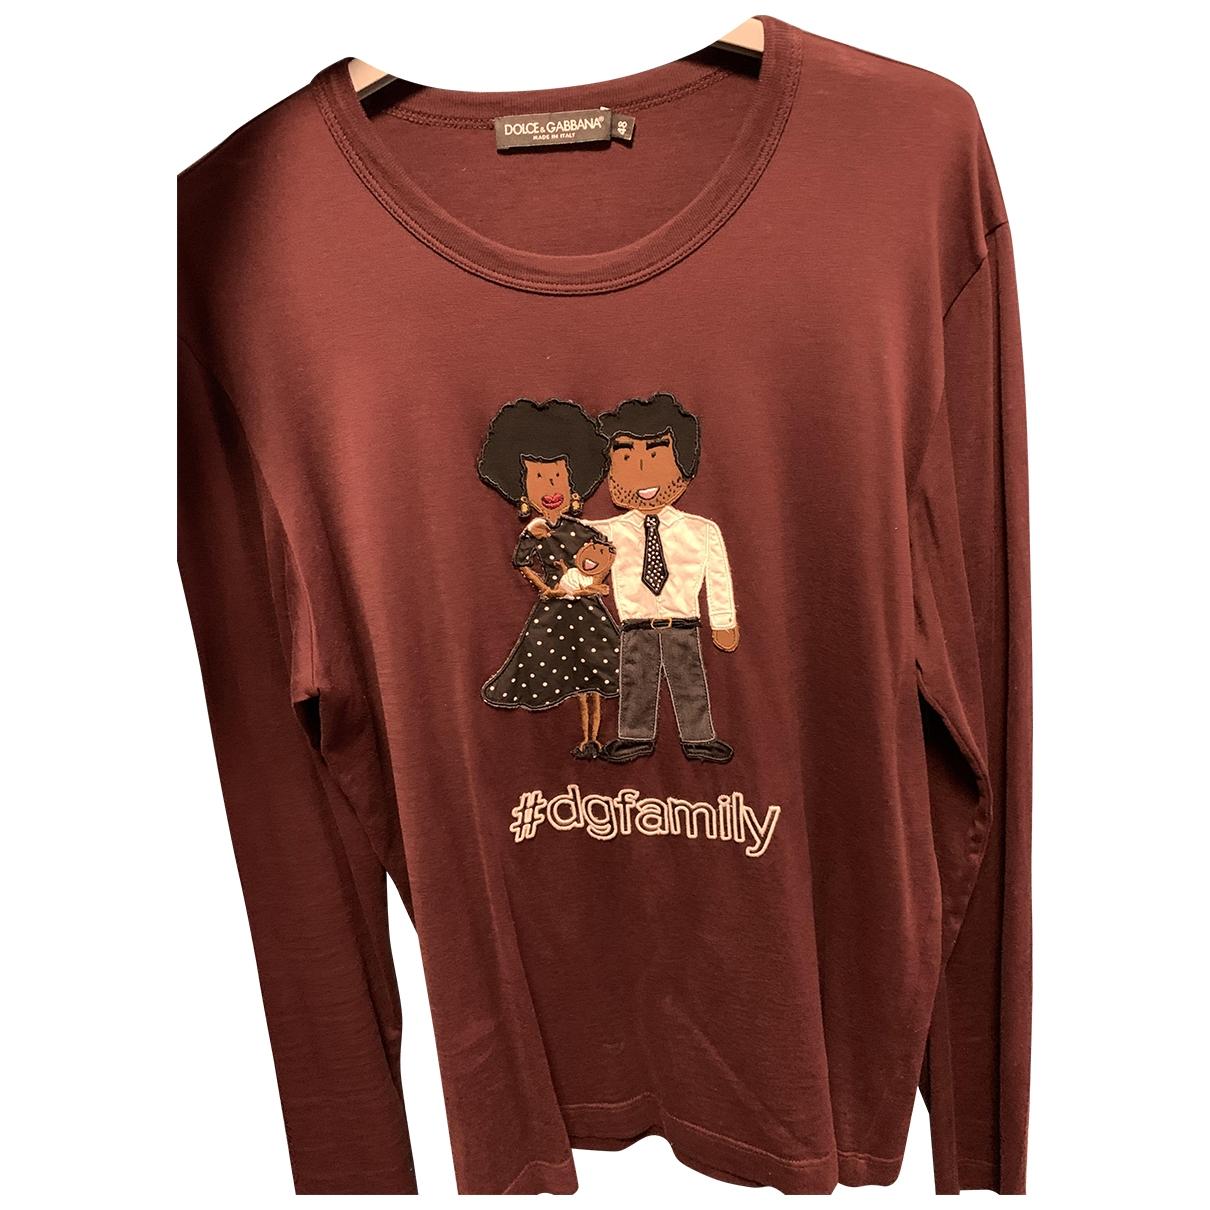 Dolce & Gabbana \N T-Shirts in  Bordeauxrot Baumwolle